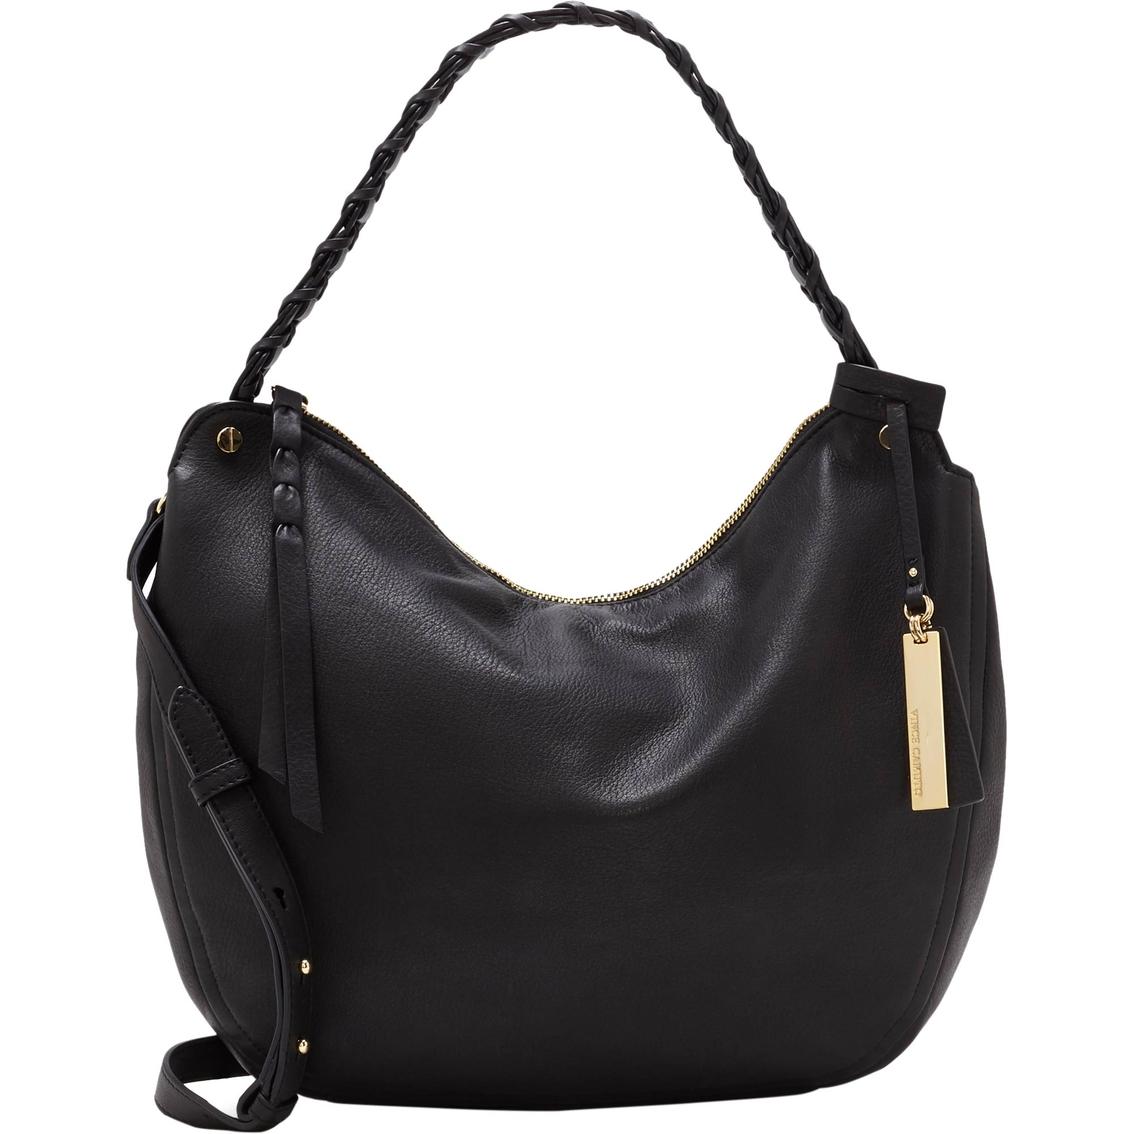 Vince Camuto Luela Small Hobo Bag